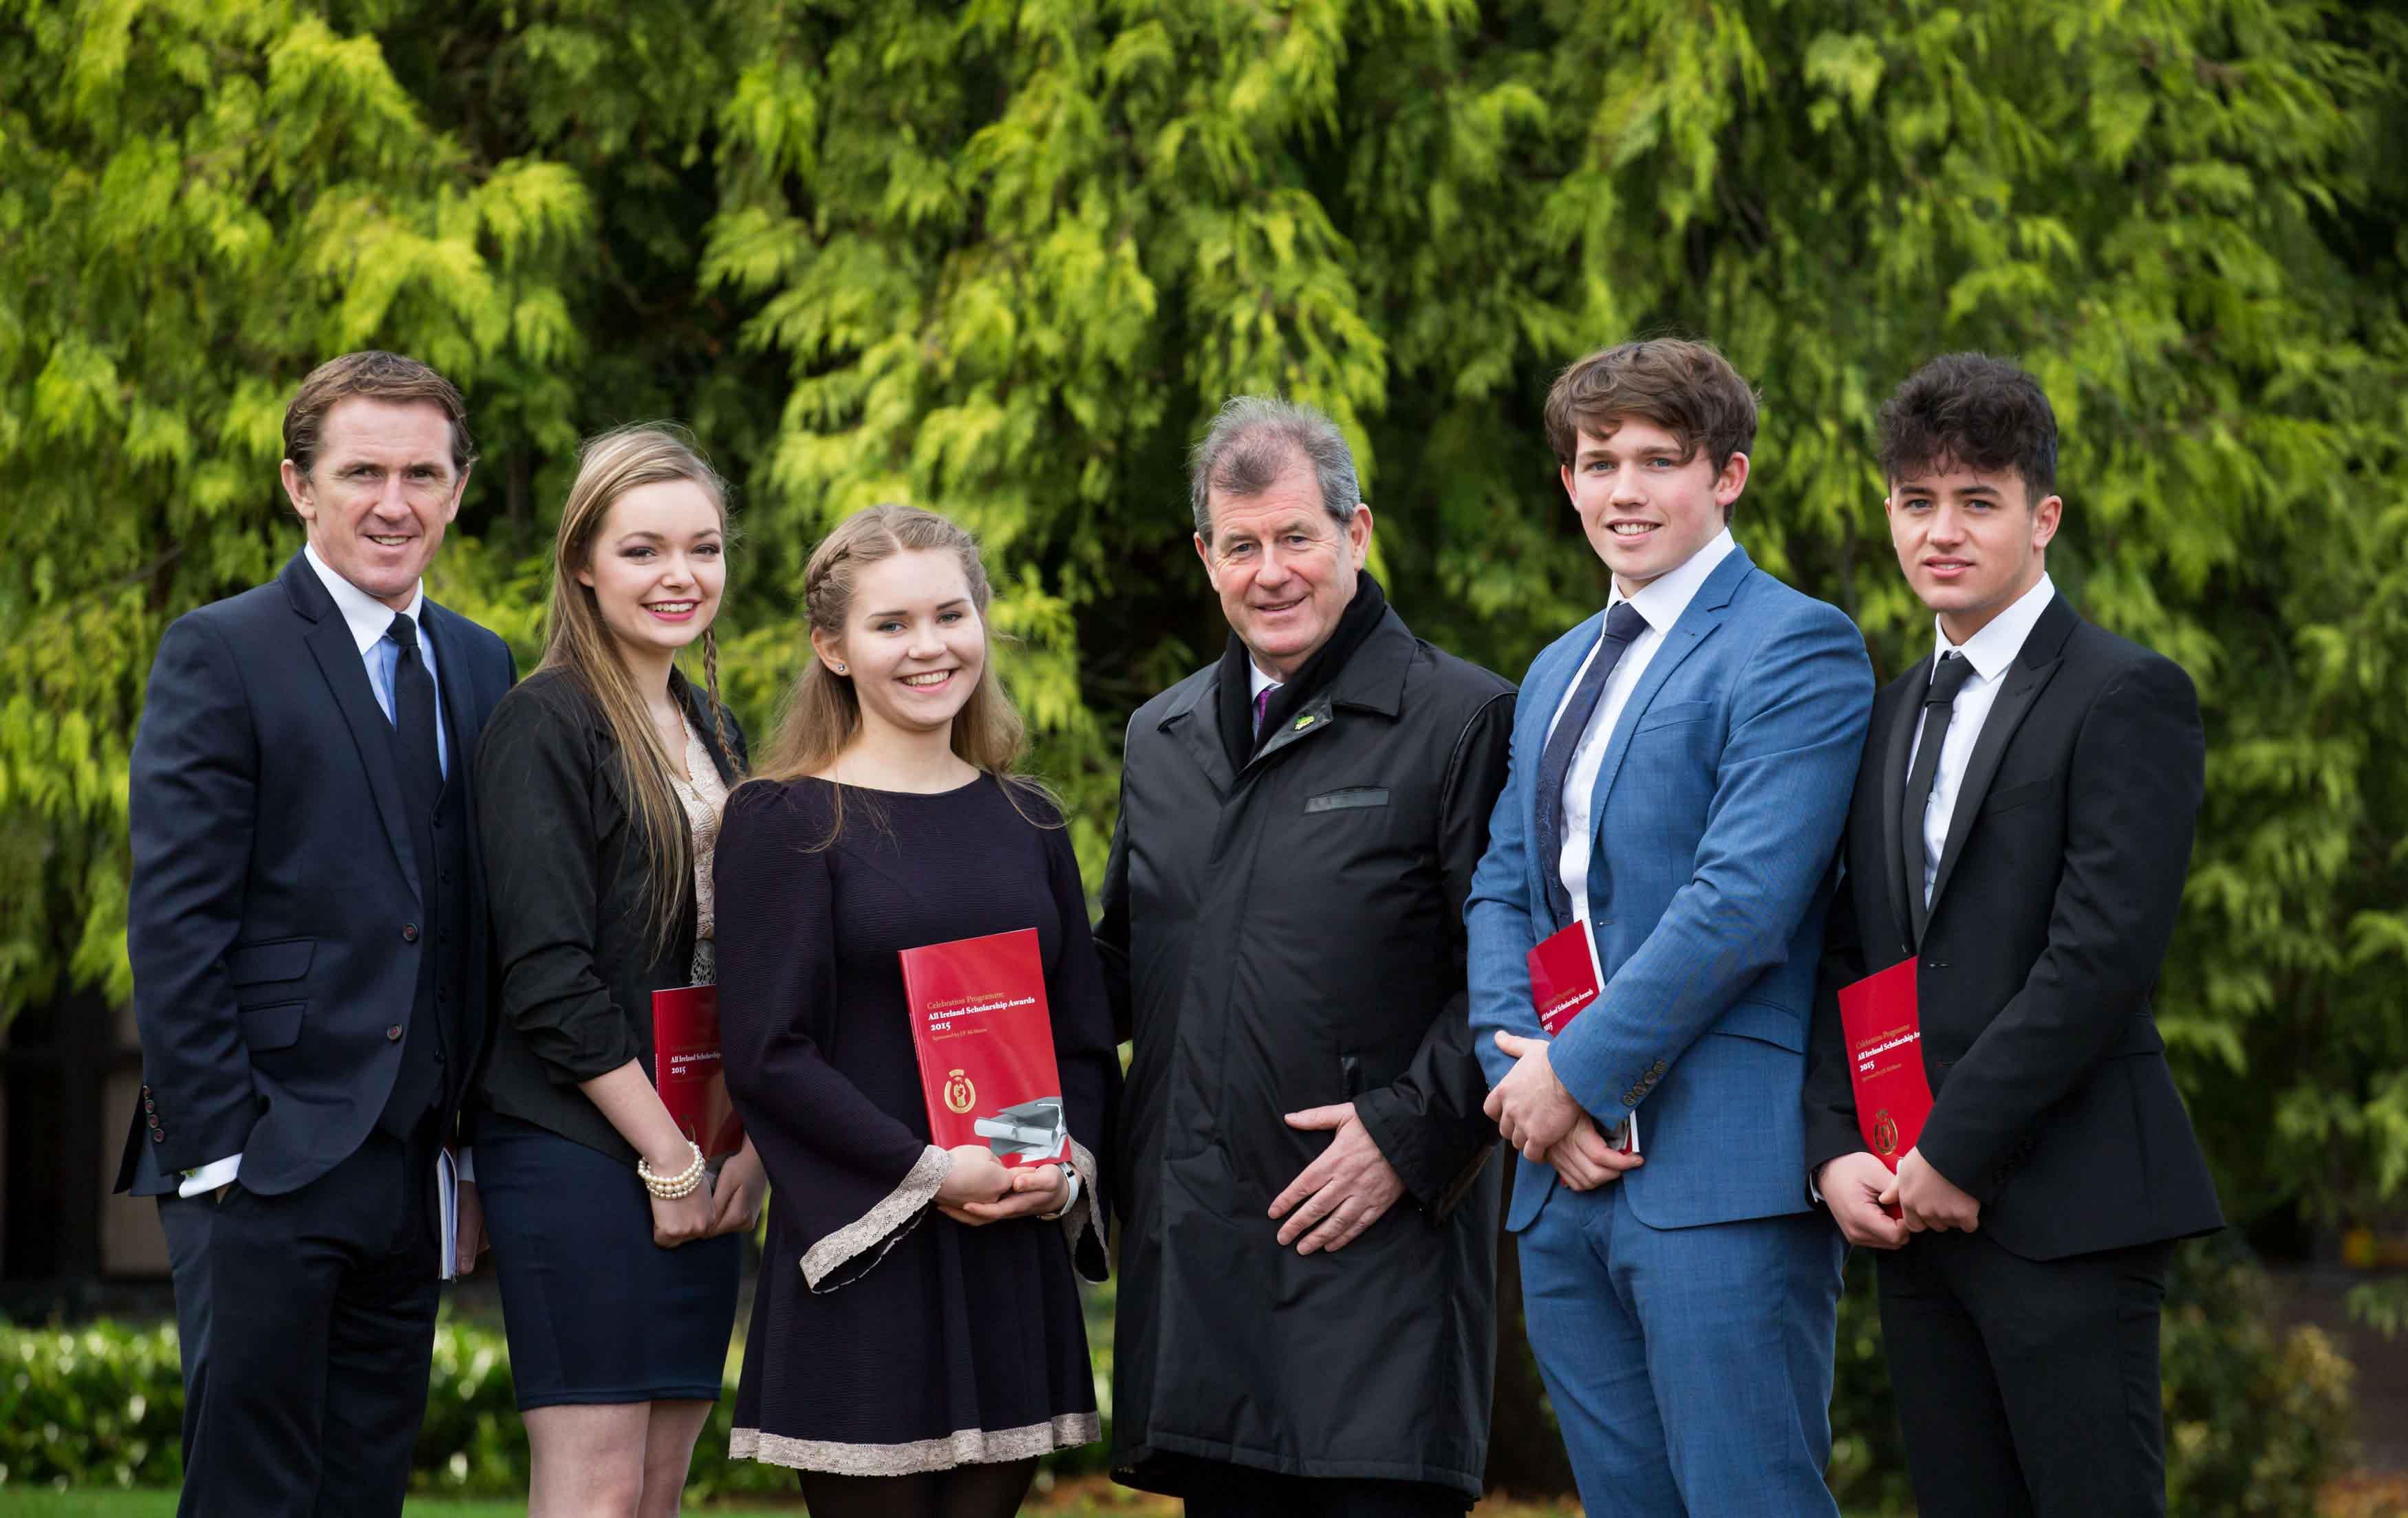 All Ireland Scholarships 2015